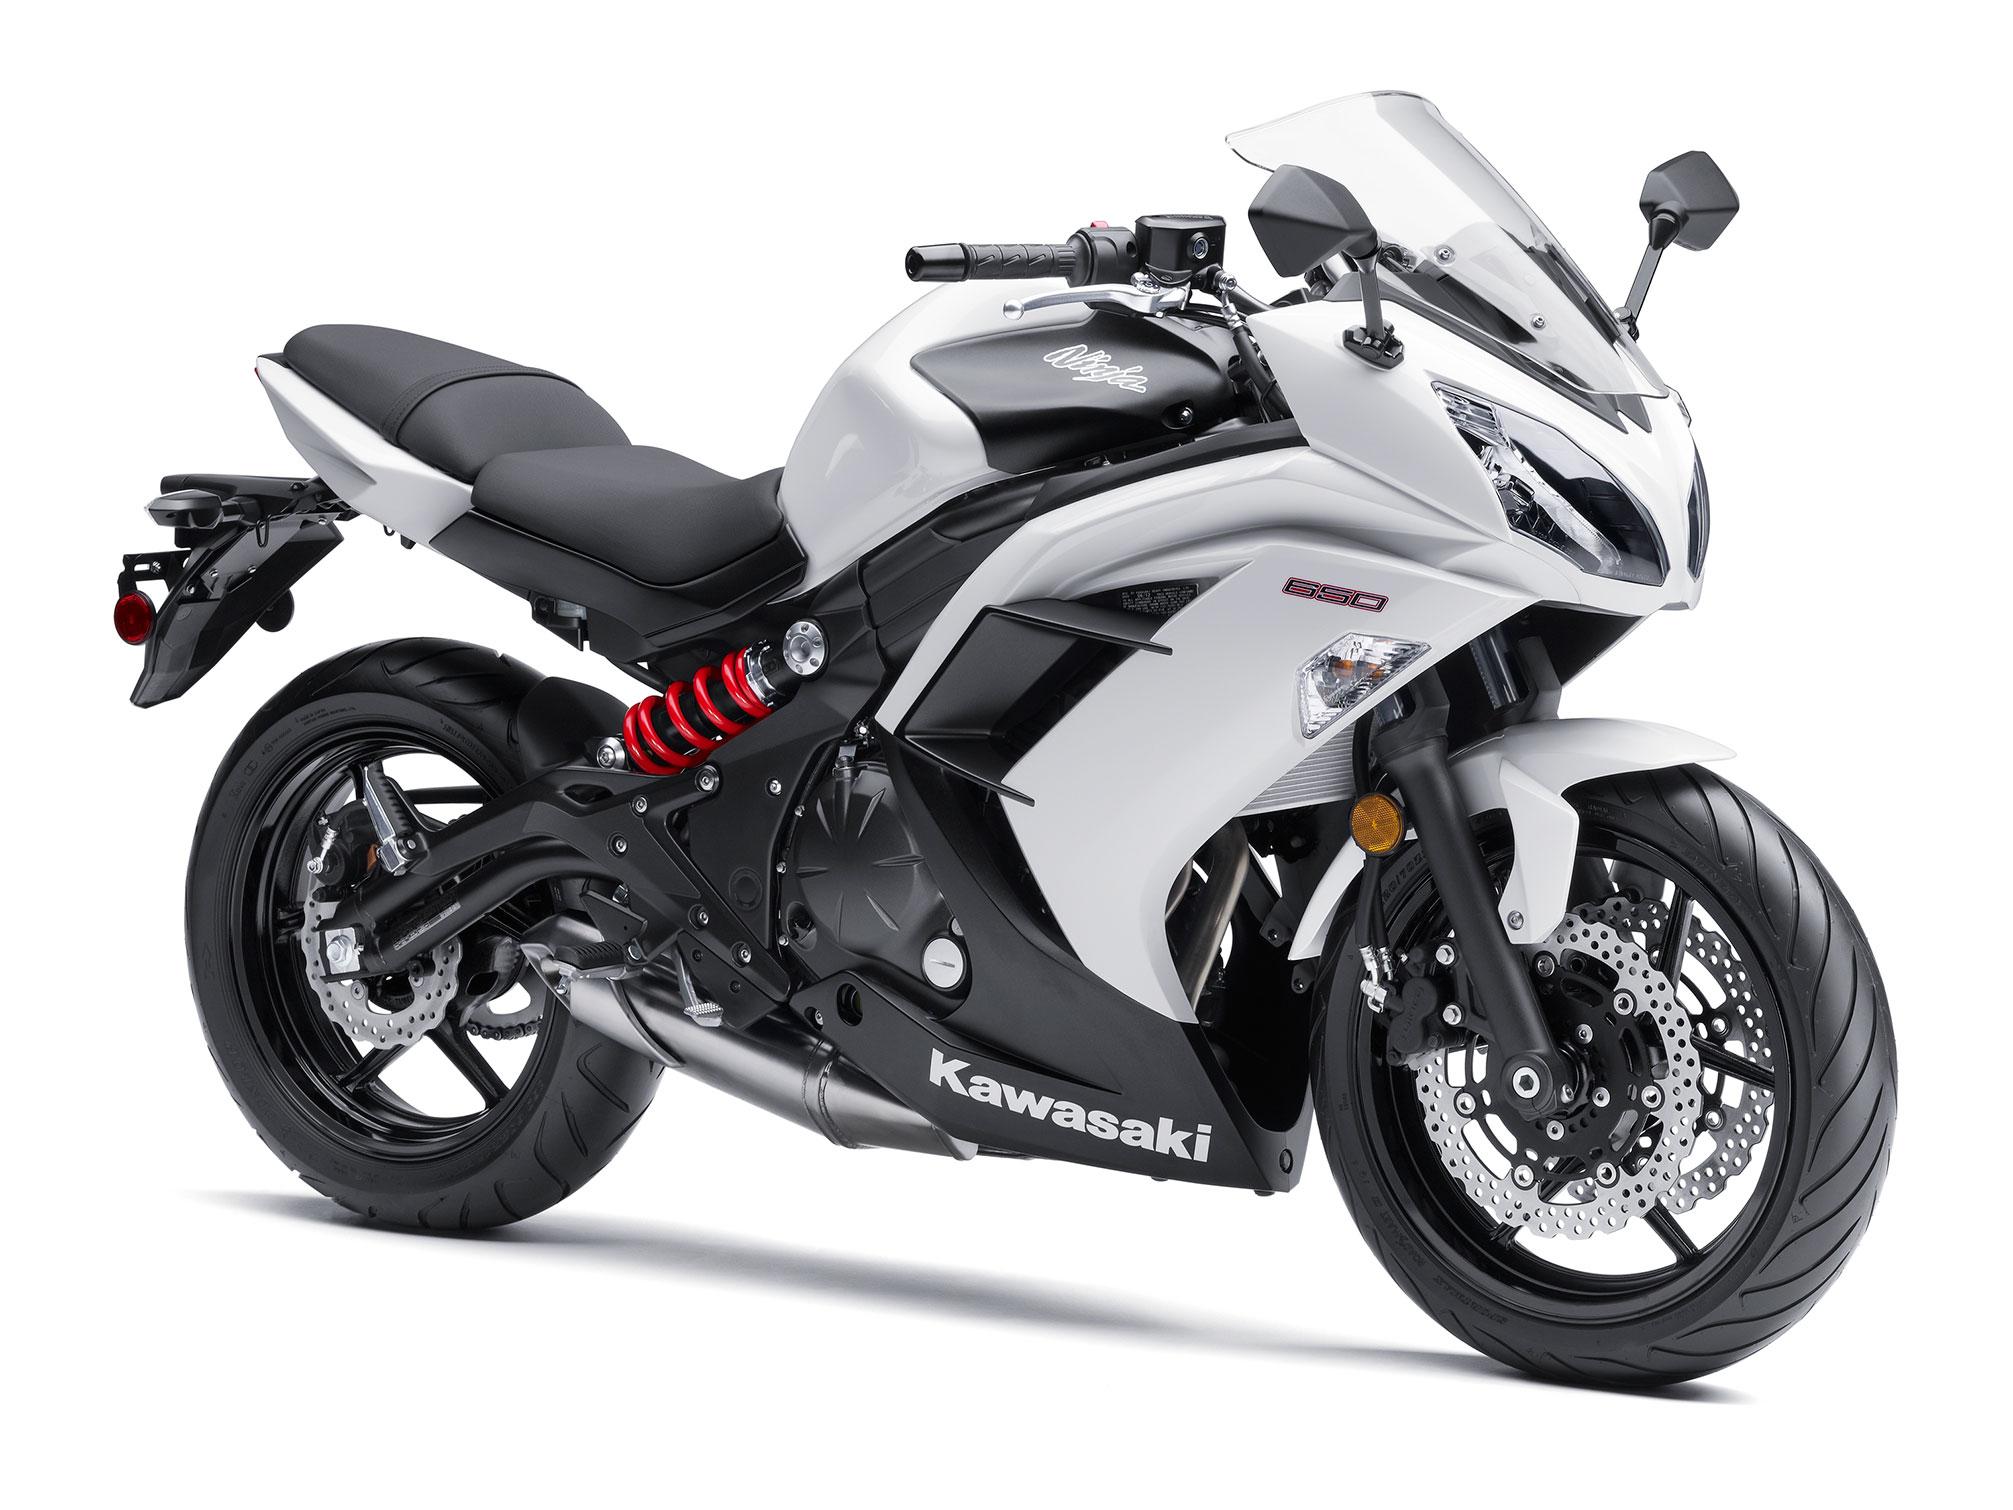 2013 Kawasaki Ninja 650   Wallpup.com